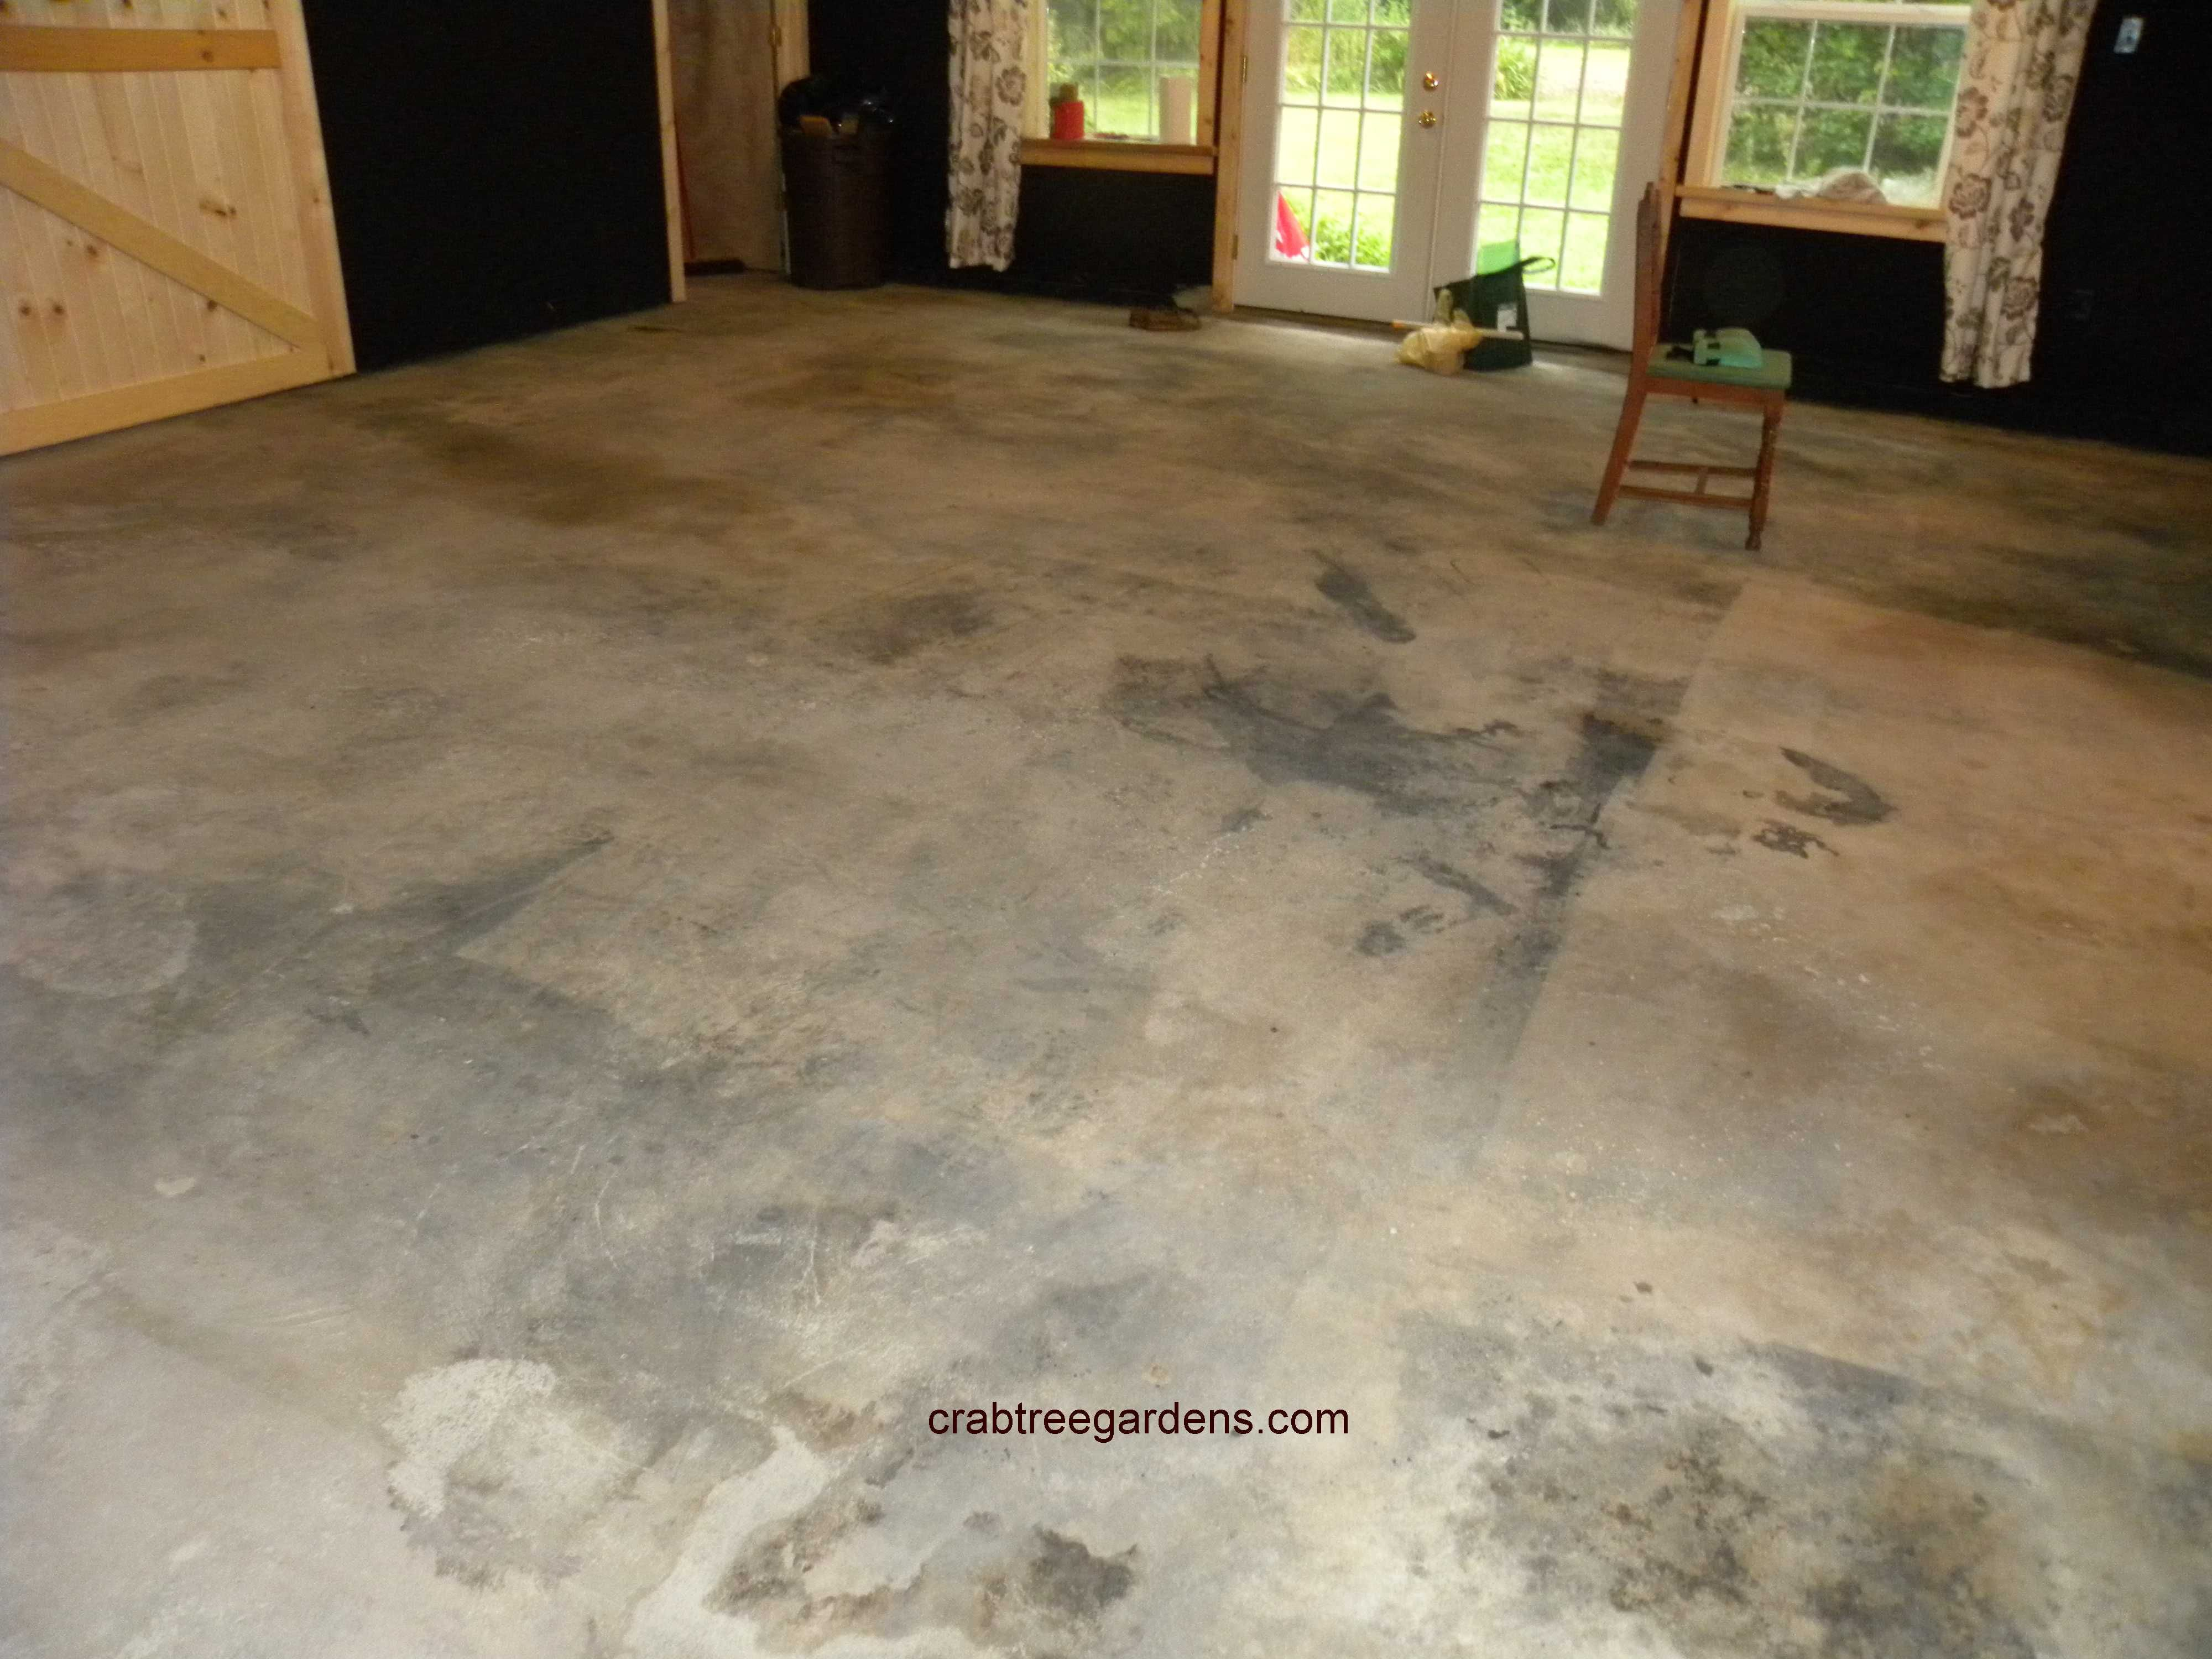 How to Make a Concrete Floor Look Like Limestone